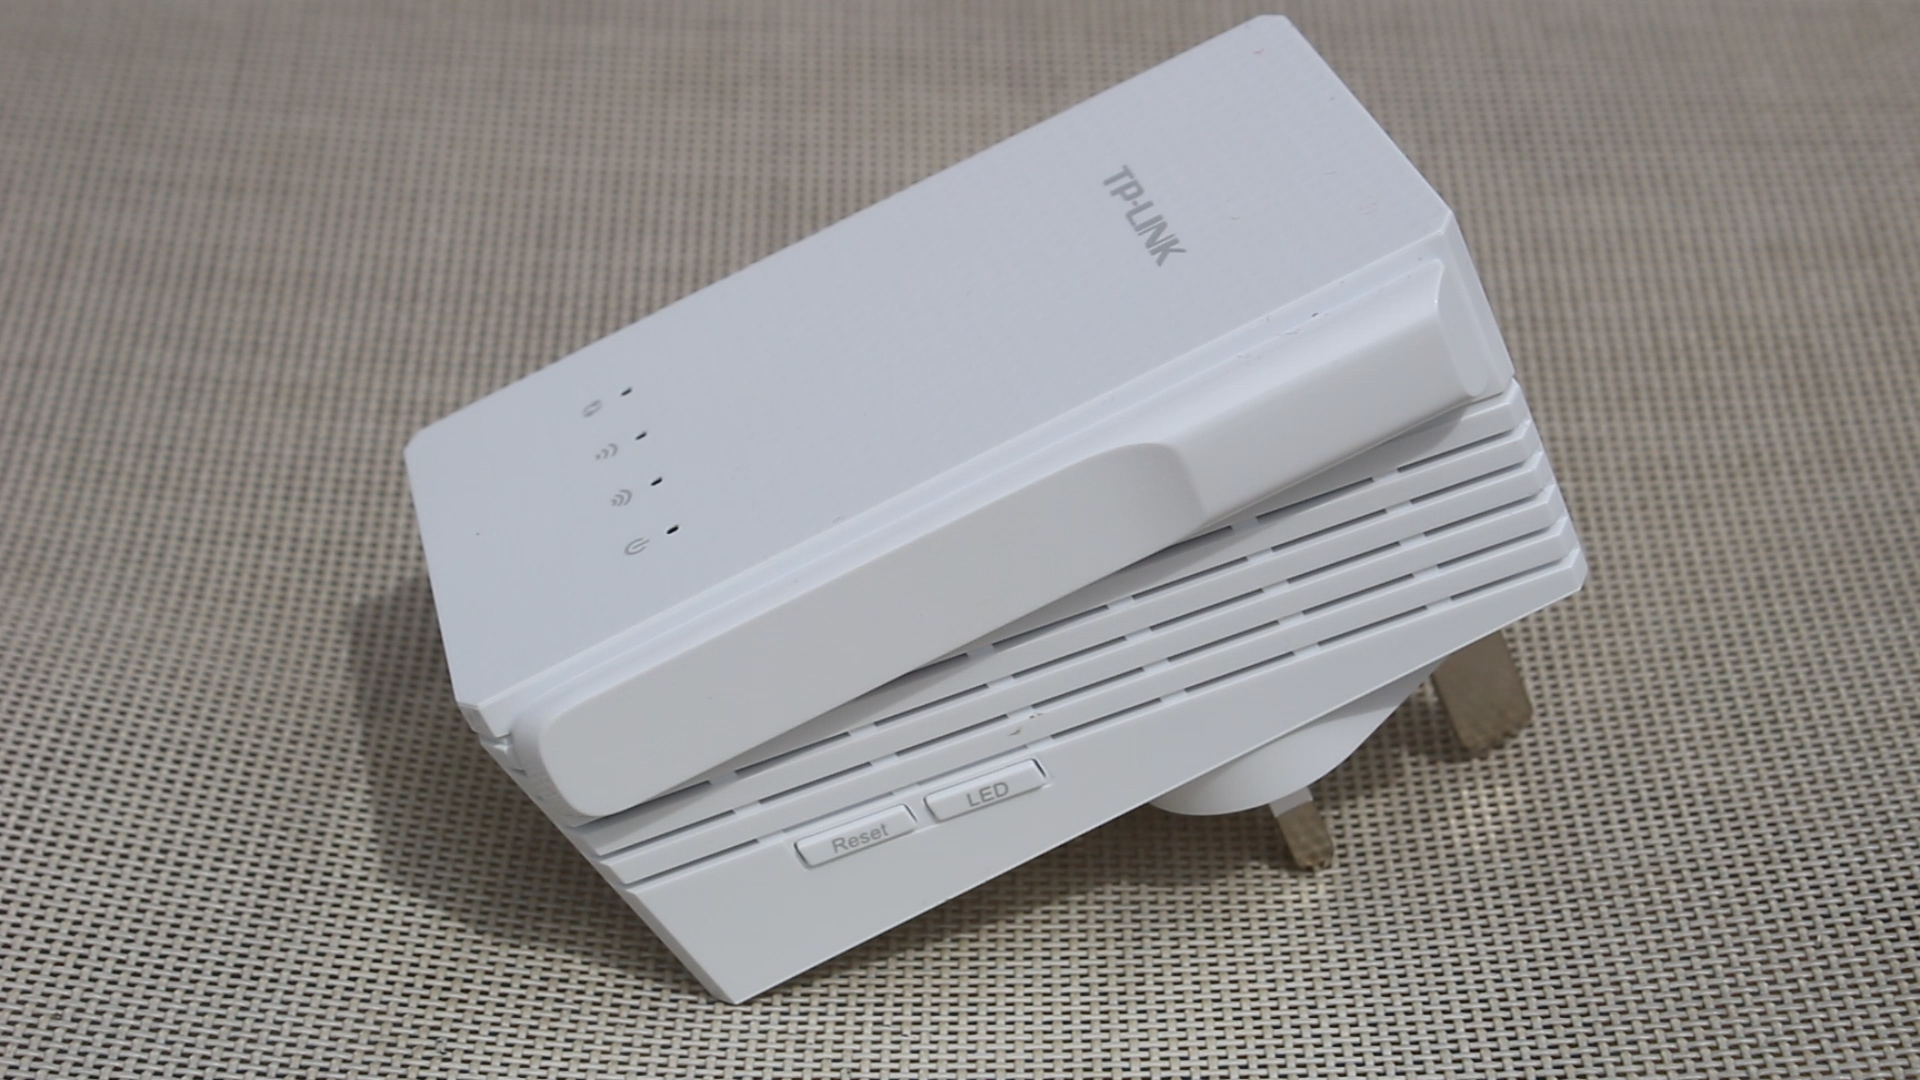 TP-Link RE210 AC750 Wifi Range Extender Review | TechteamGB